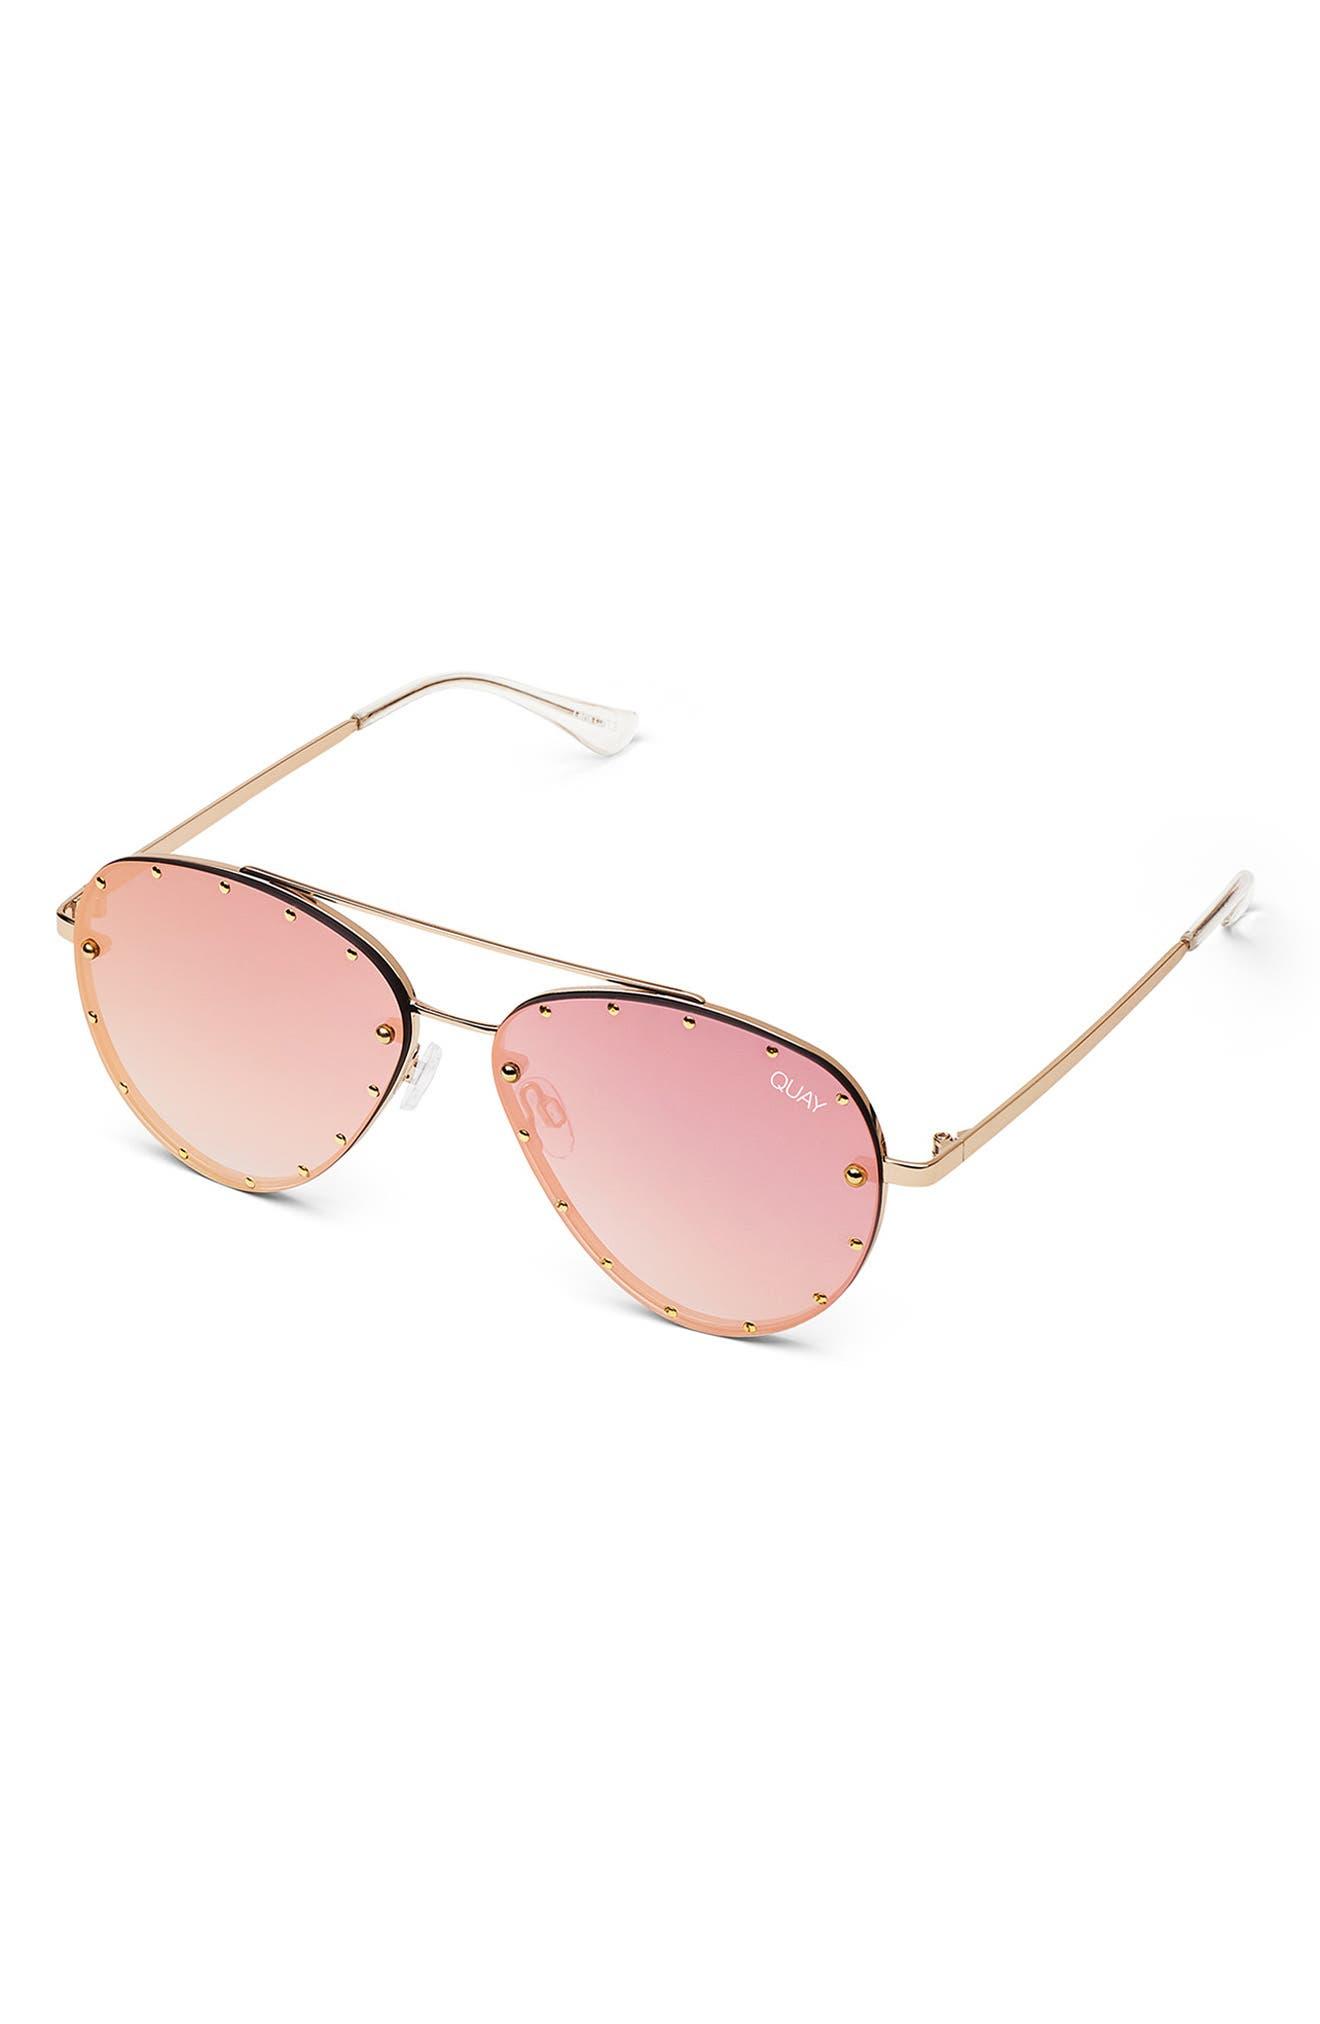 x Jaclyn Hill Roxanne 62mm Stud Aviator Sunglasses,                             Alternate thumbnail 3, color,                             GOLD / ROSE